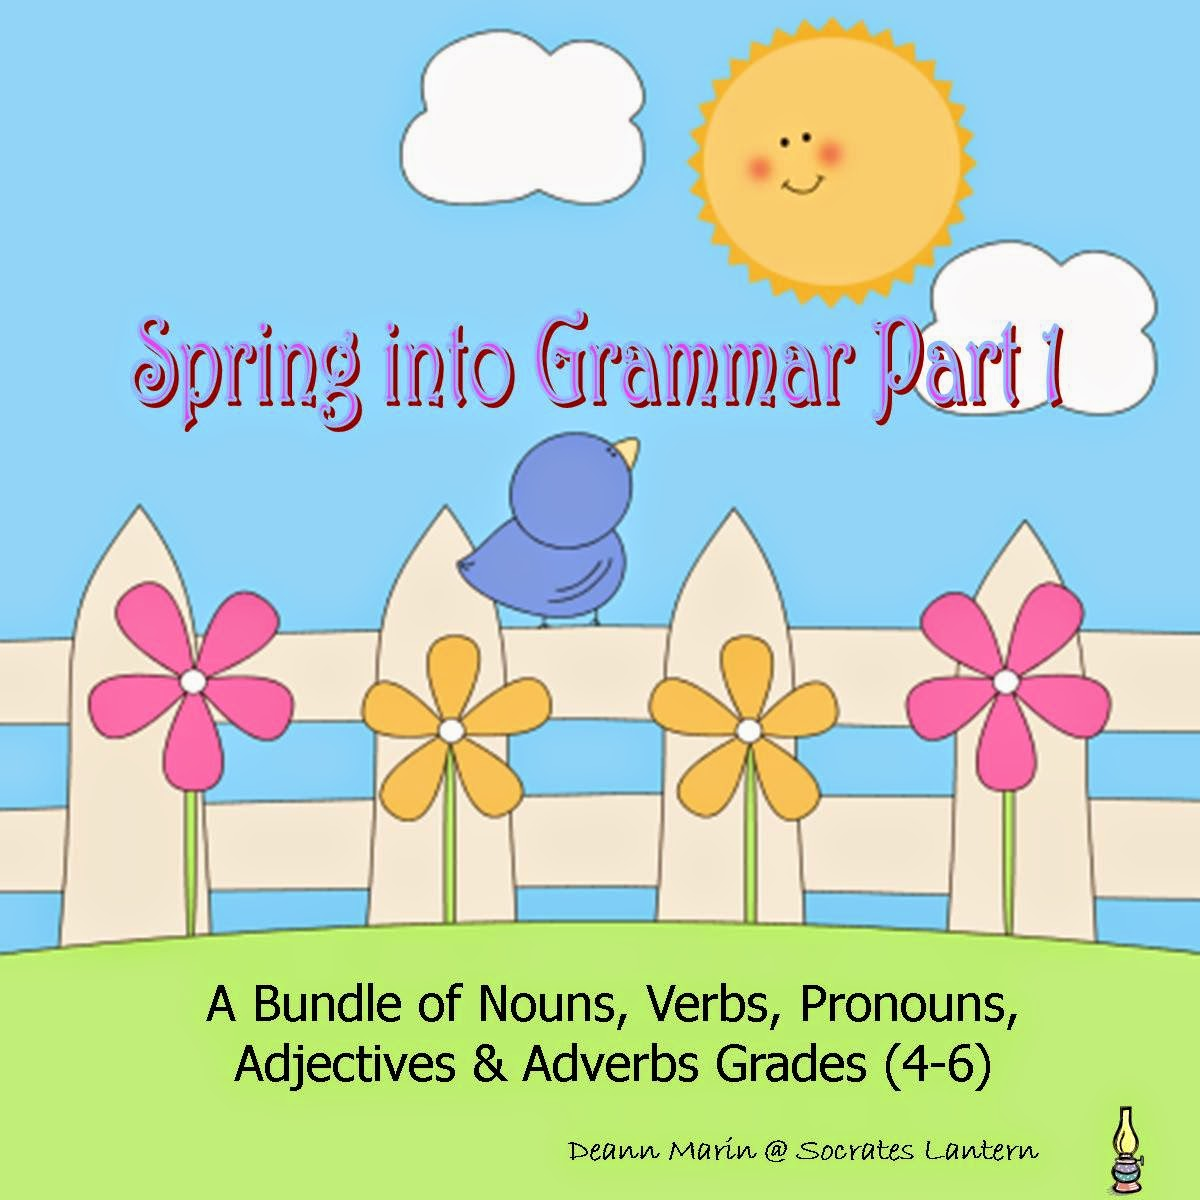 The Best Of Teacher Entrepreneurs Ii Spring Into Grammar